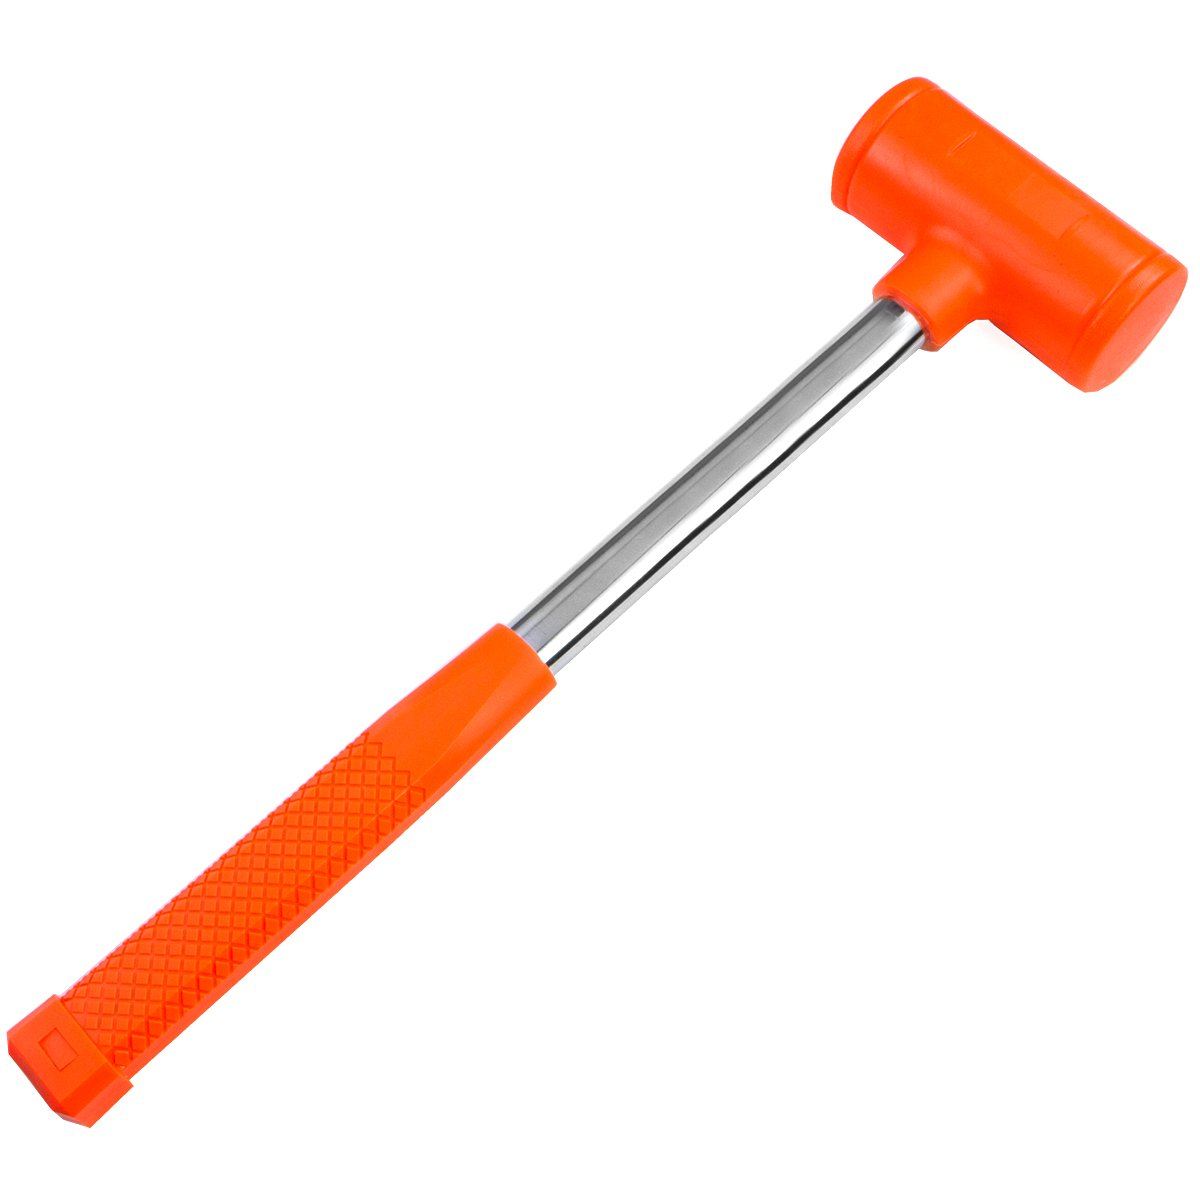 STKUSA Dead Blow Hammer 6Lb